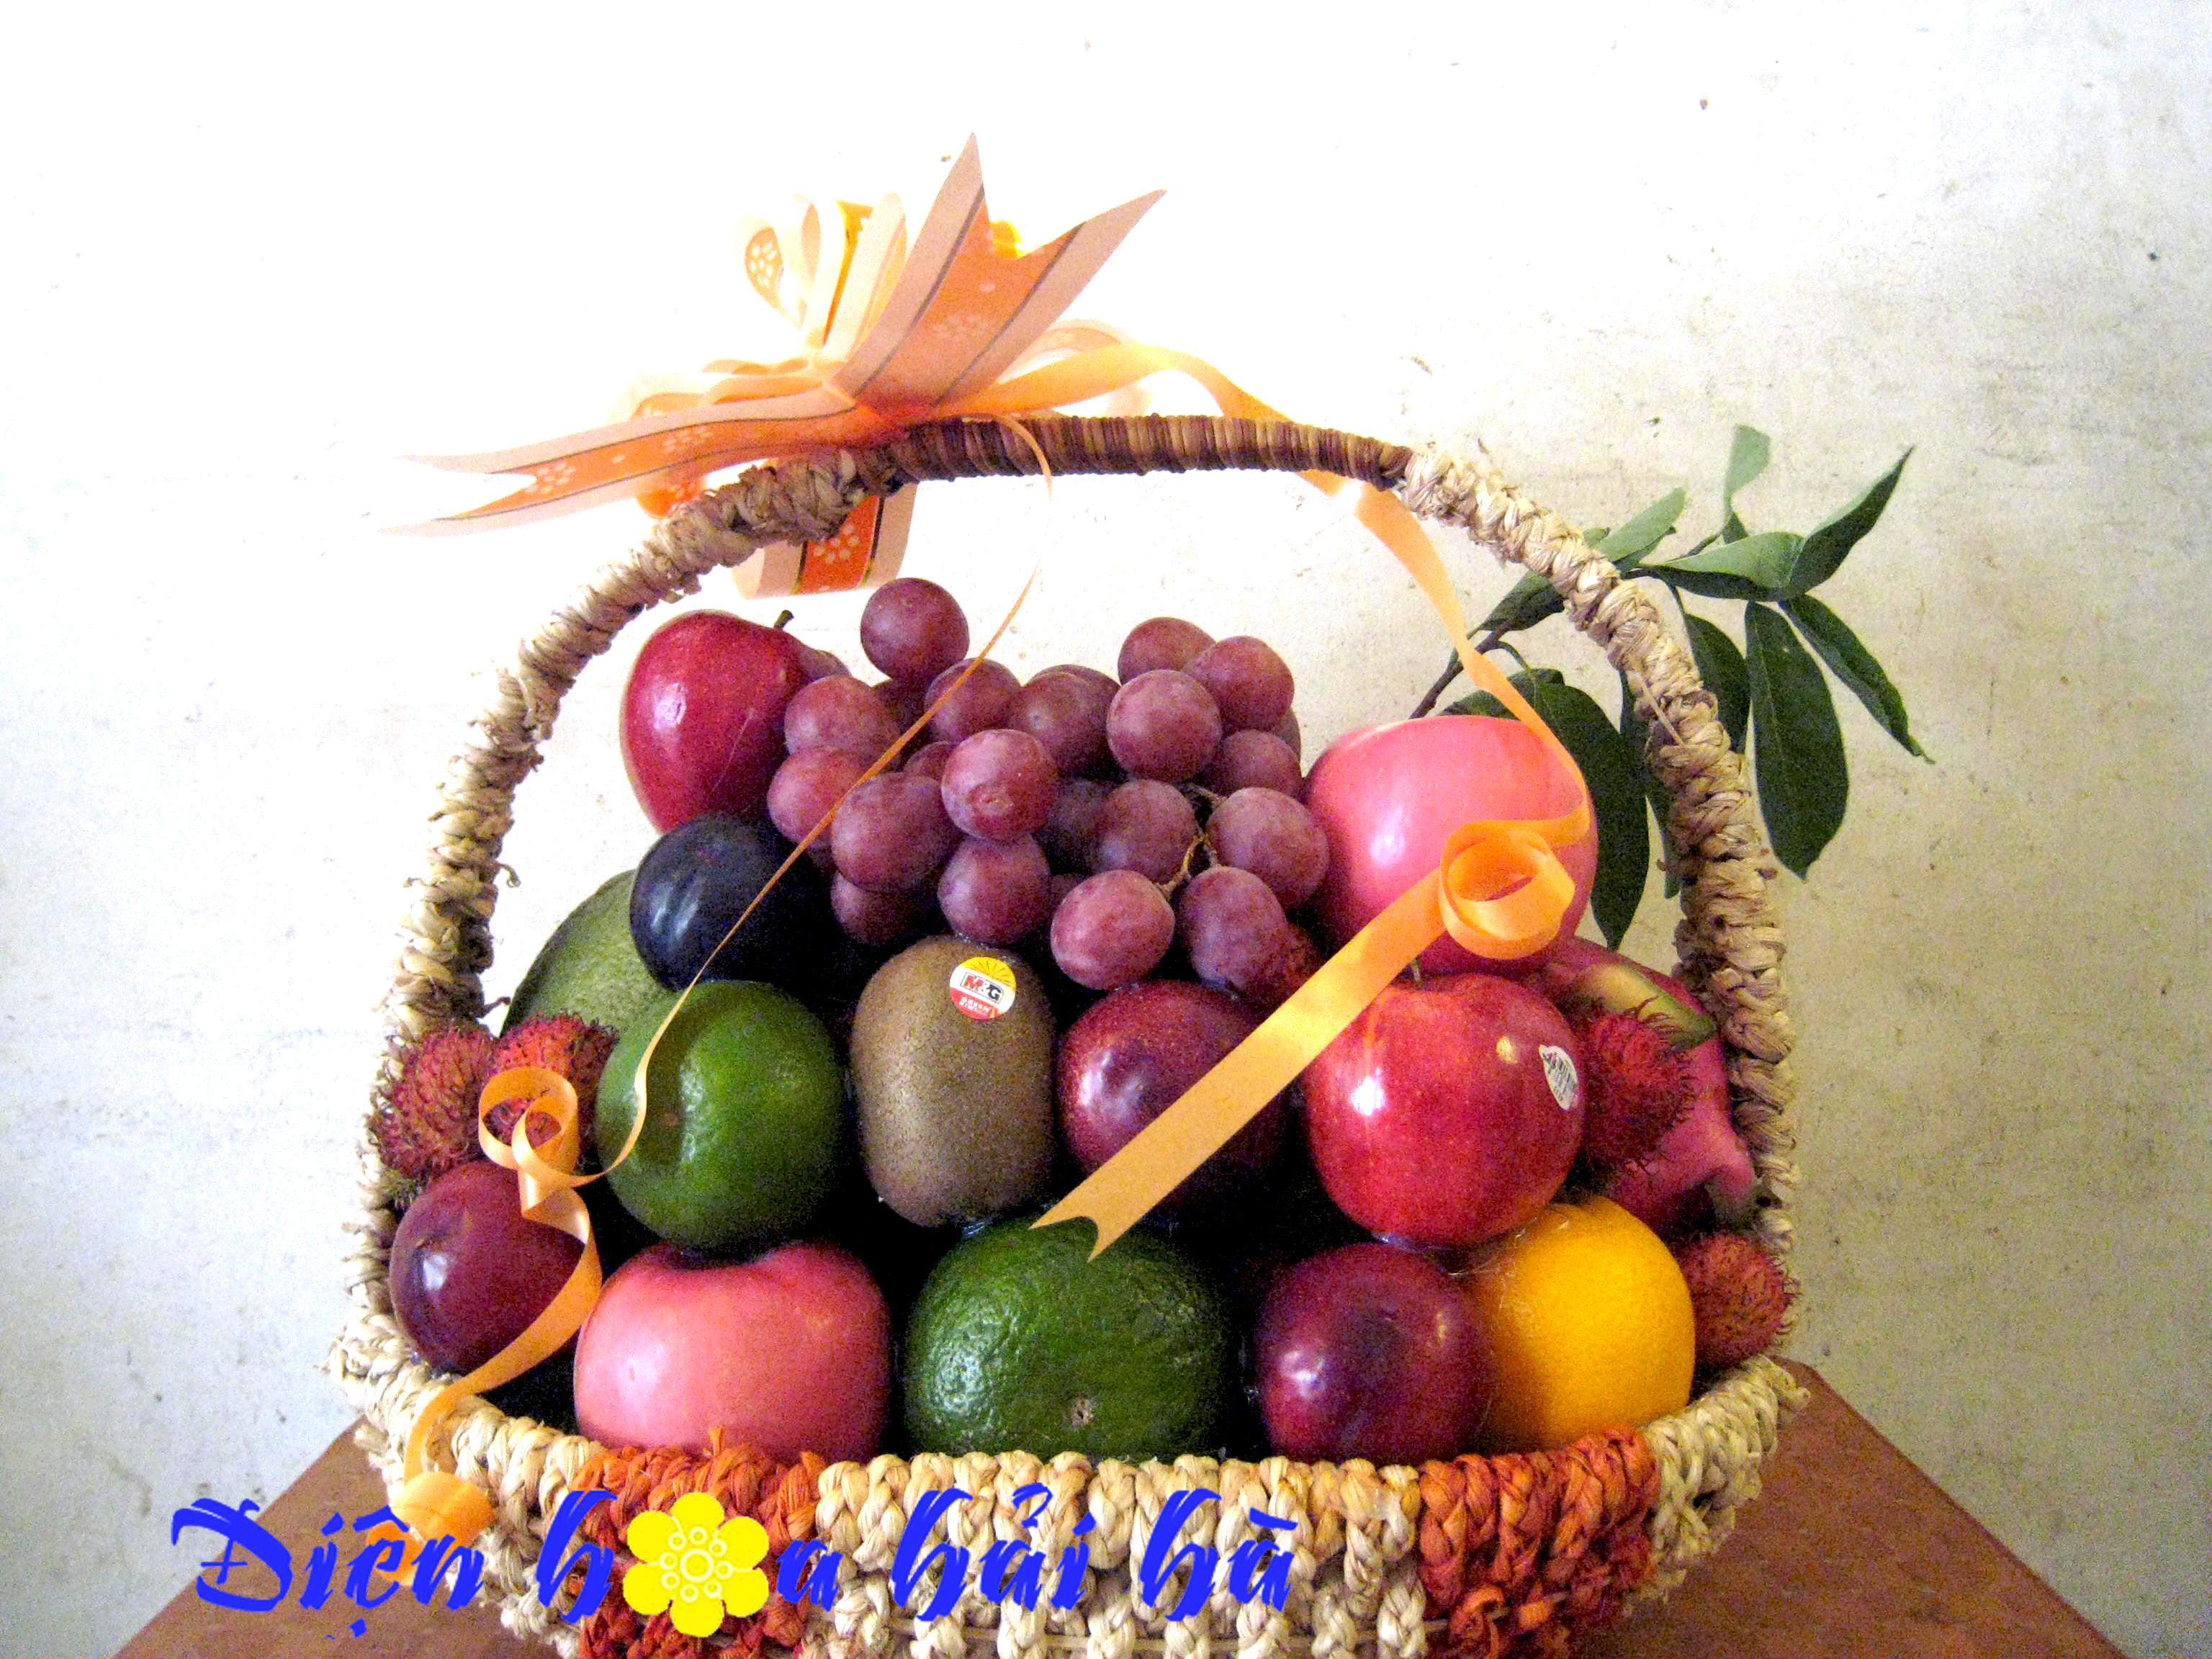 Mẫu giỏ hoa quả 19